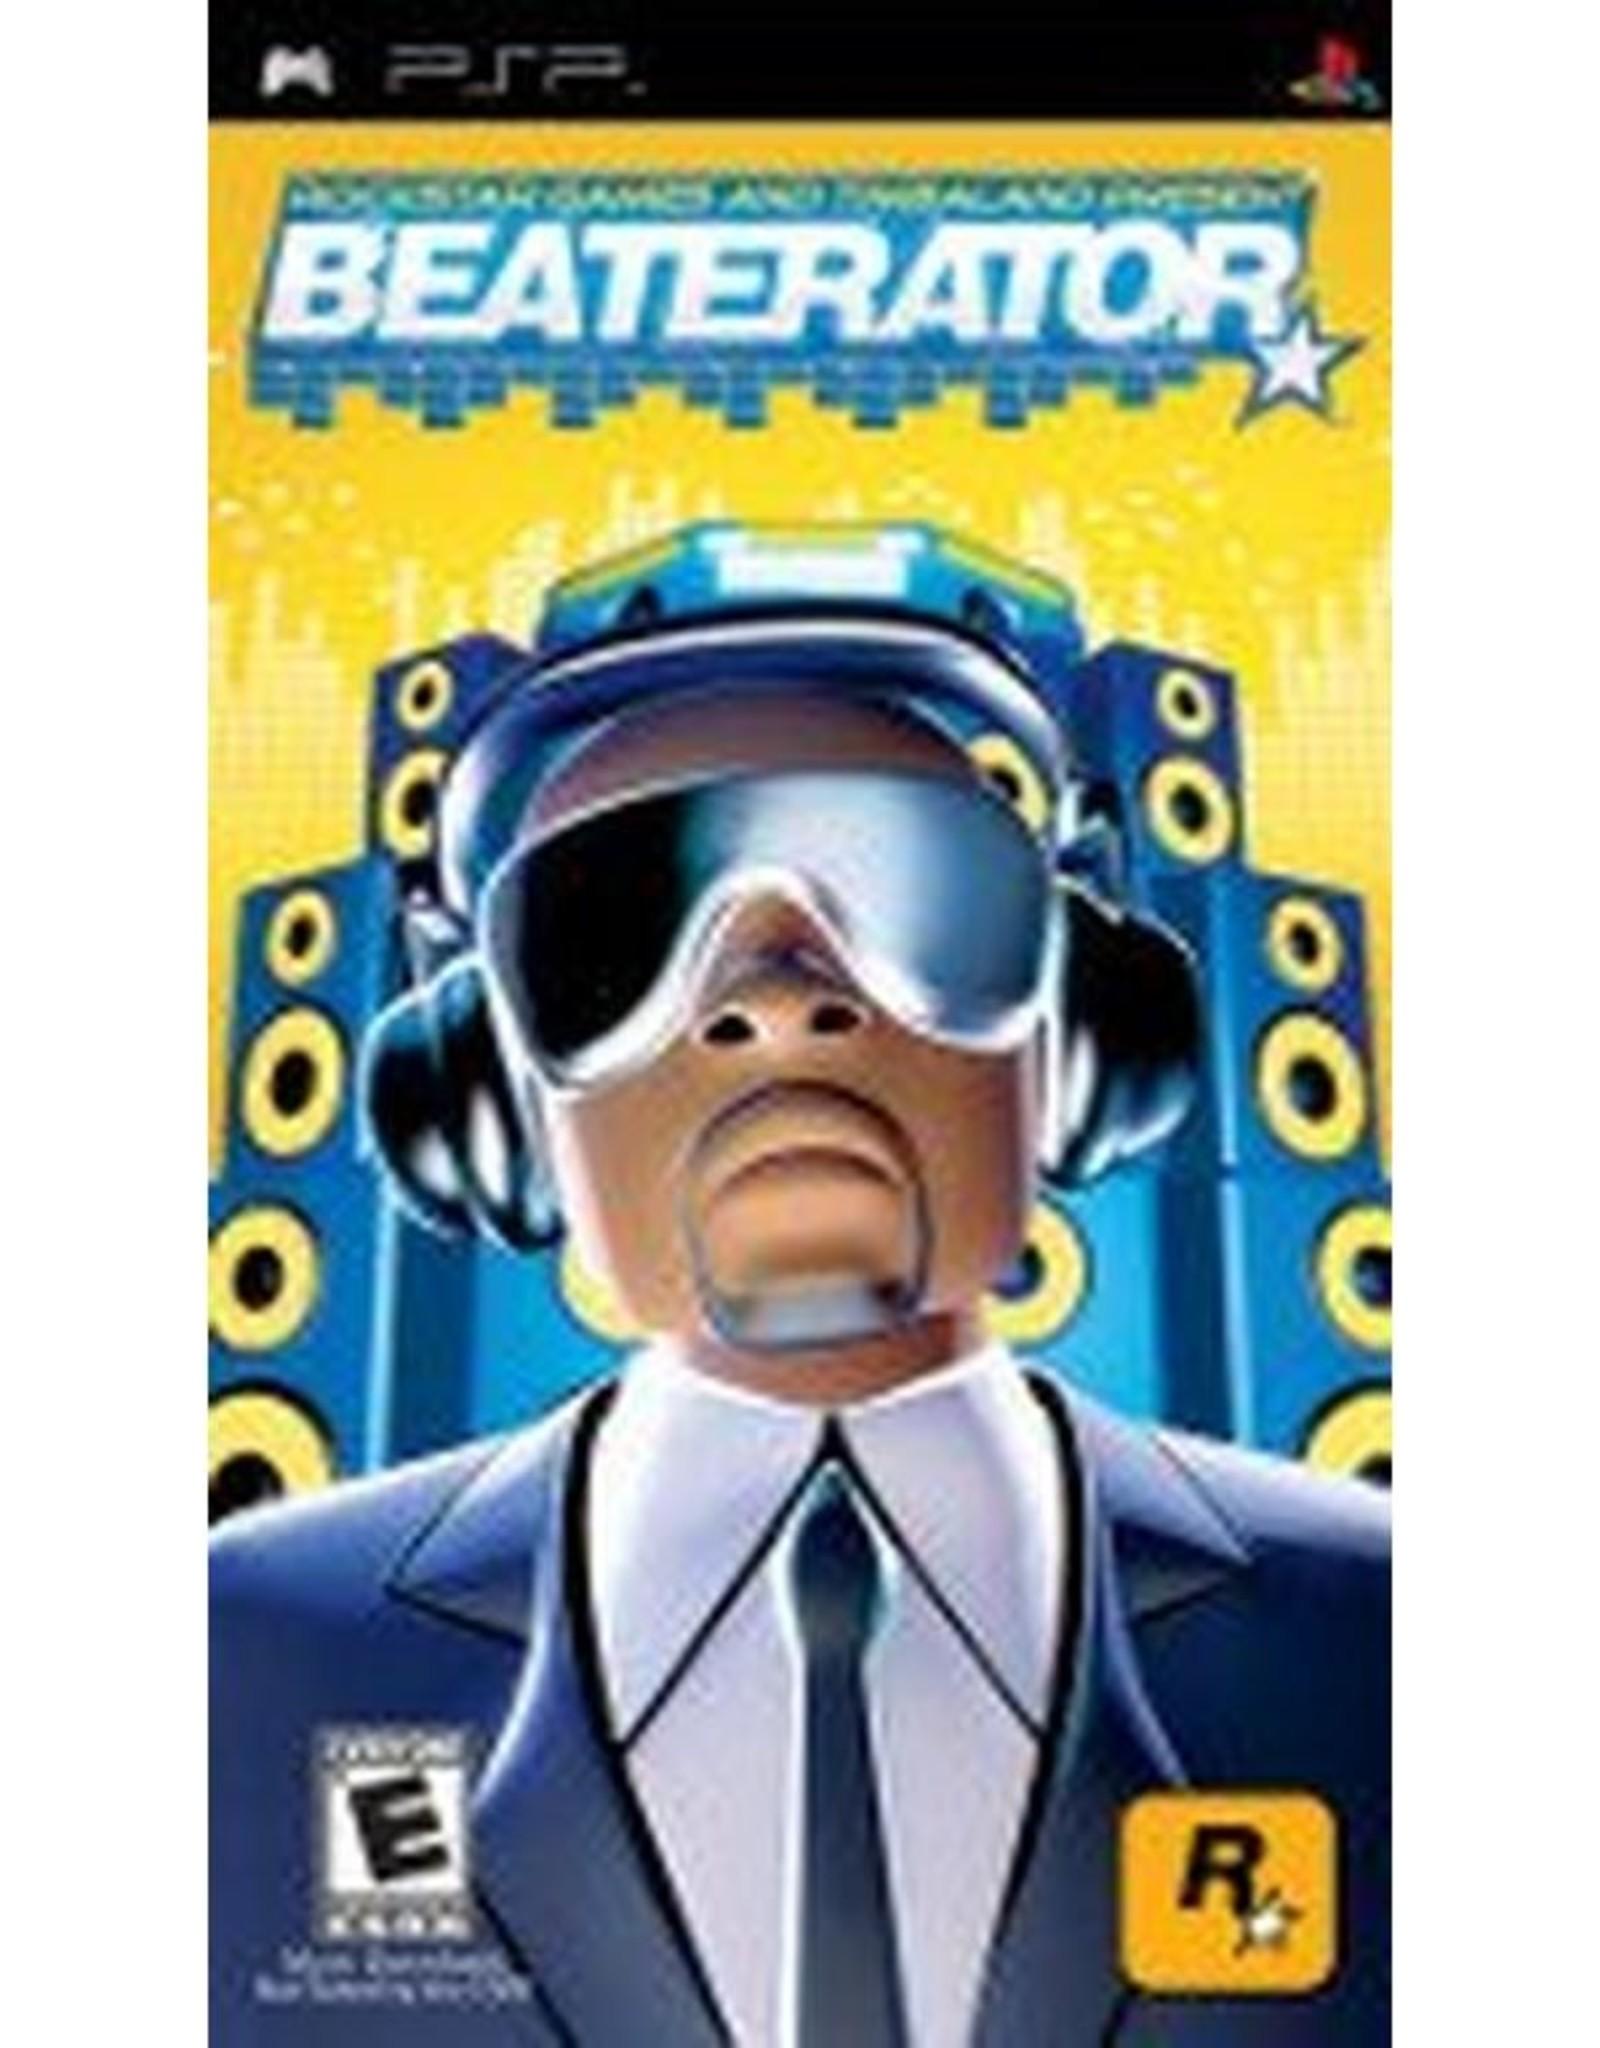 PSP Beaterator